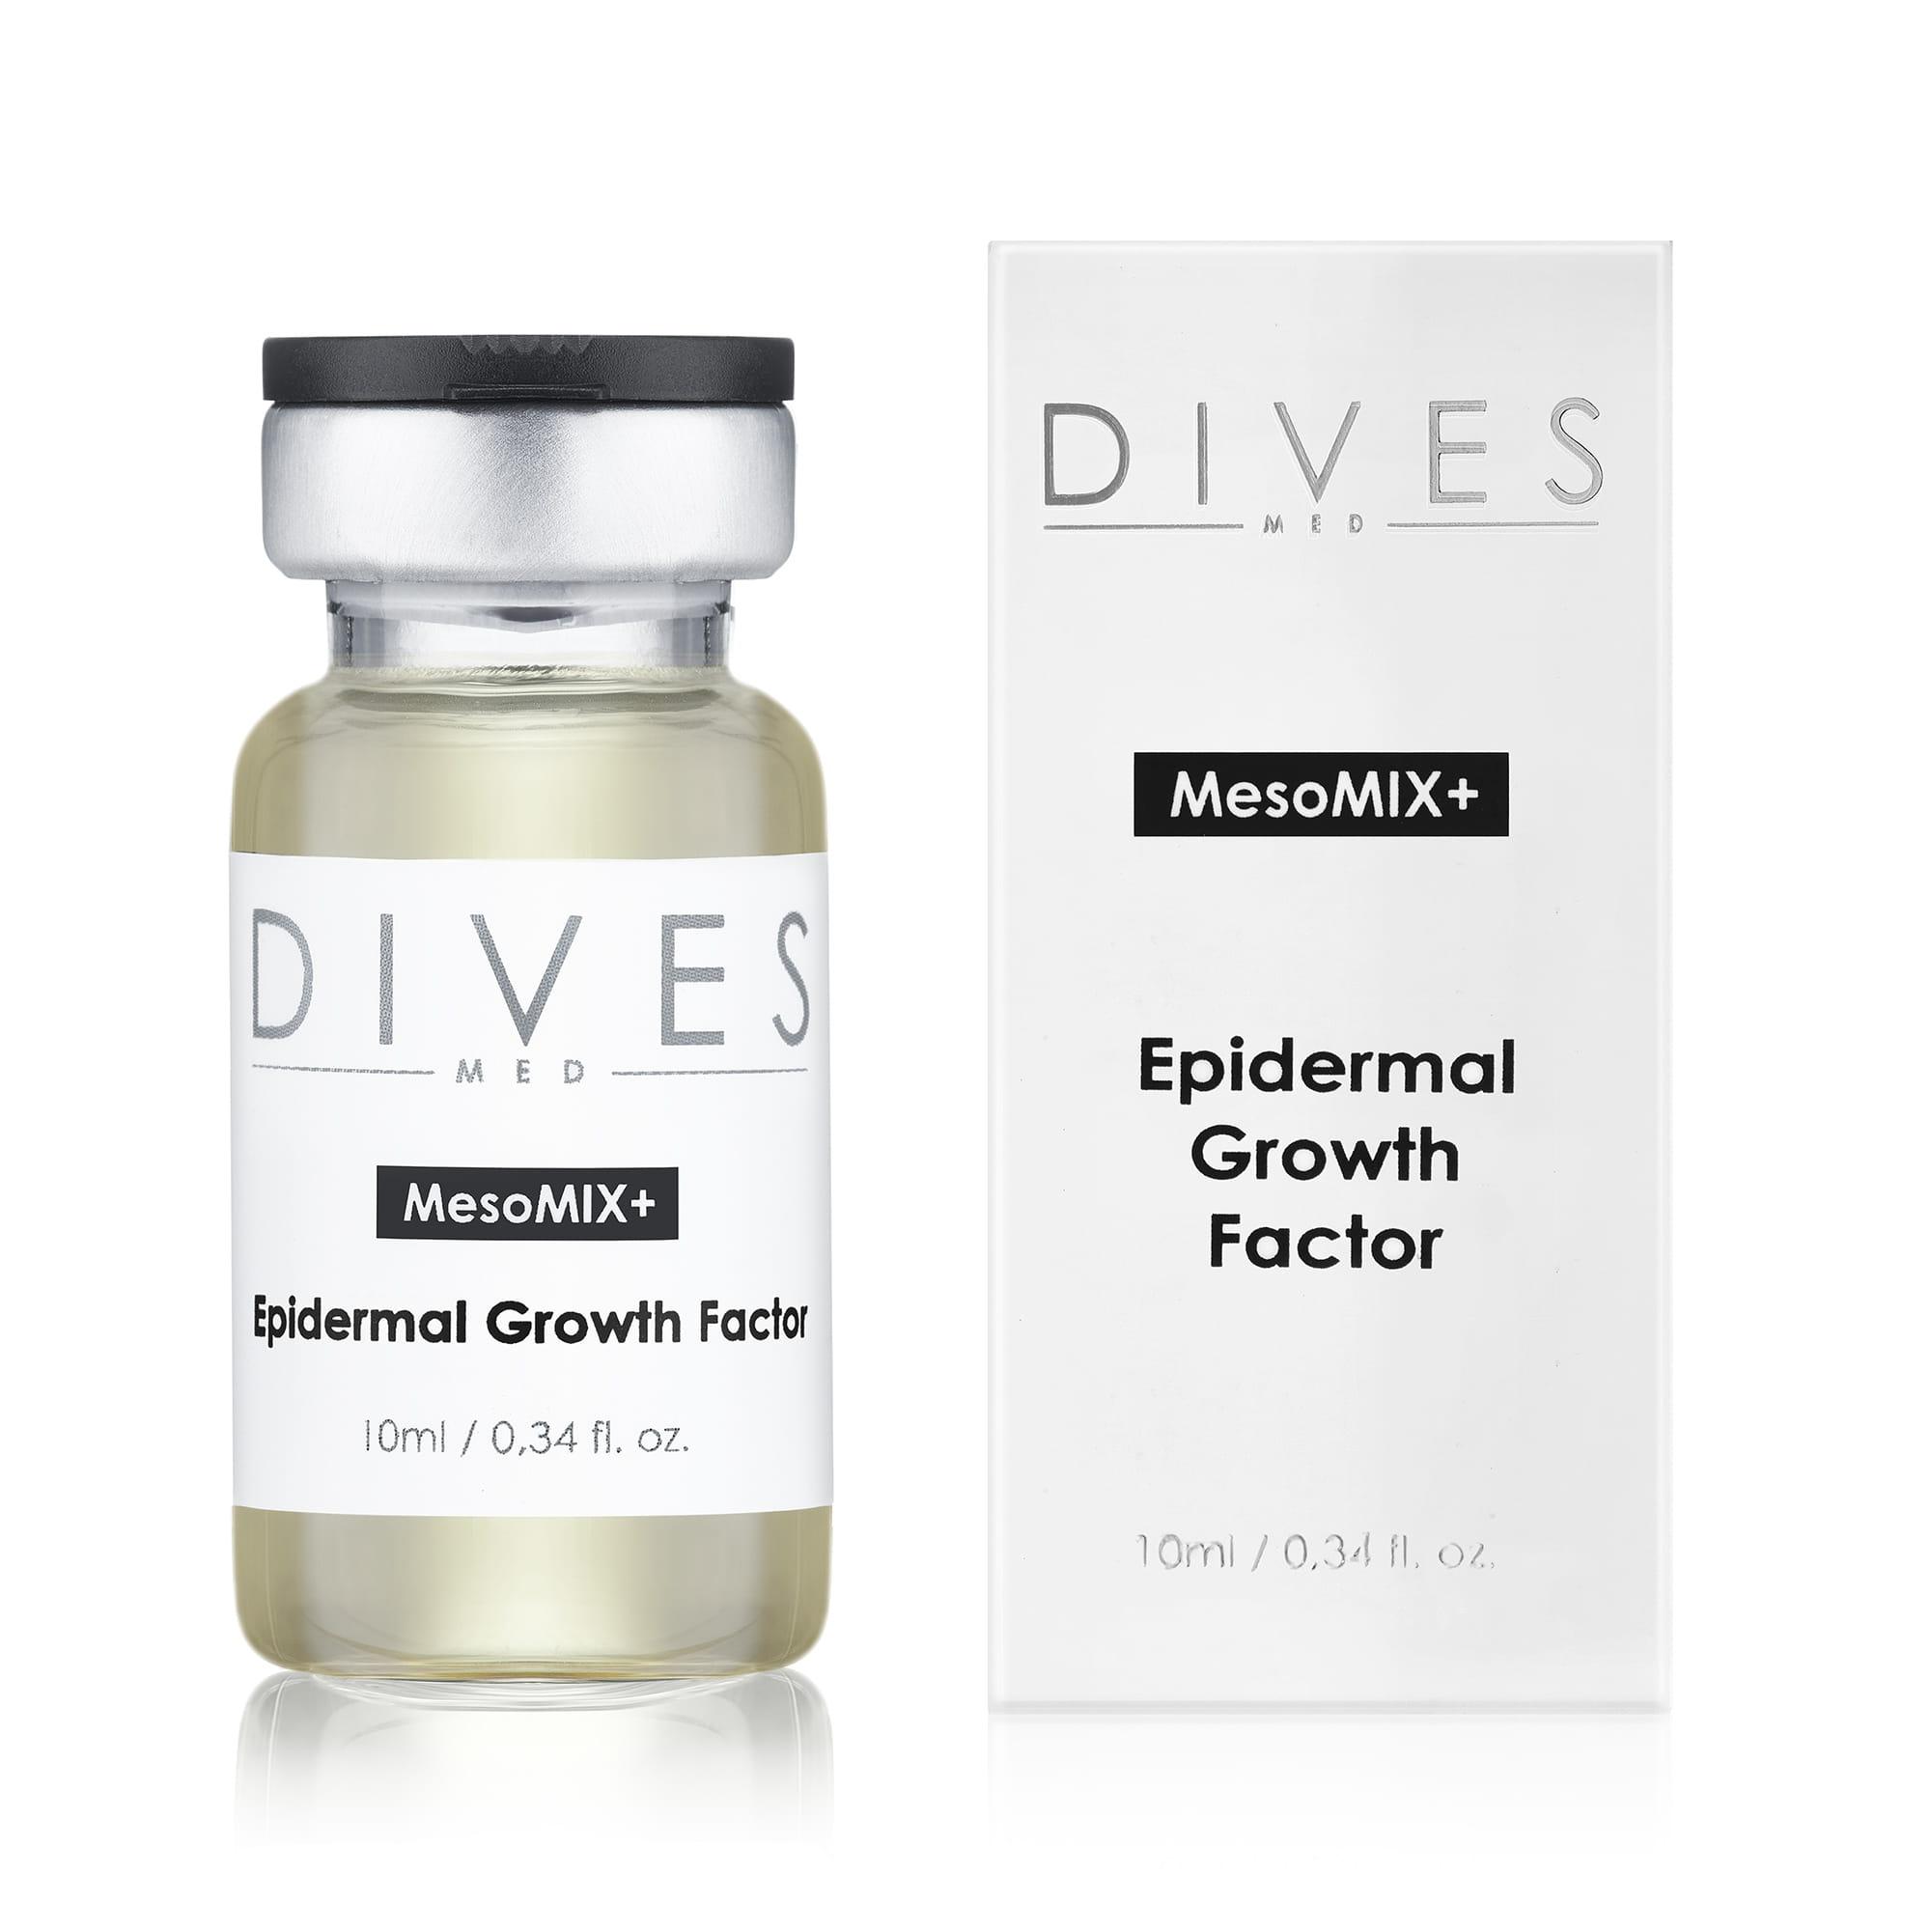 DIVES Med. Epidermal Growth Factor EGF 10ml